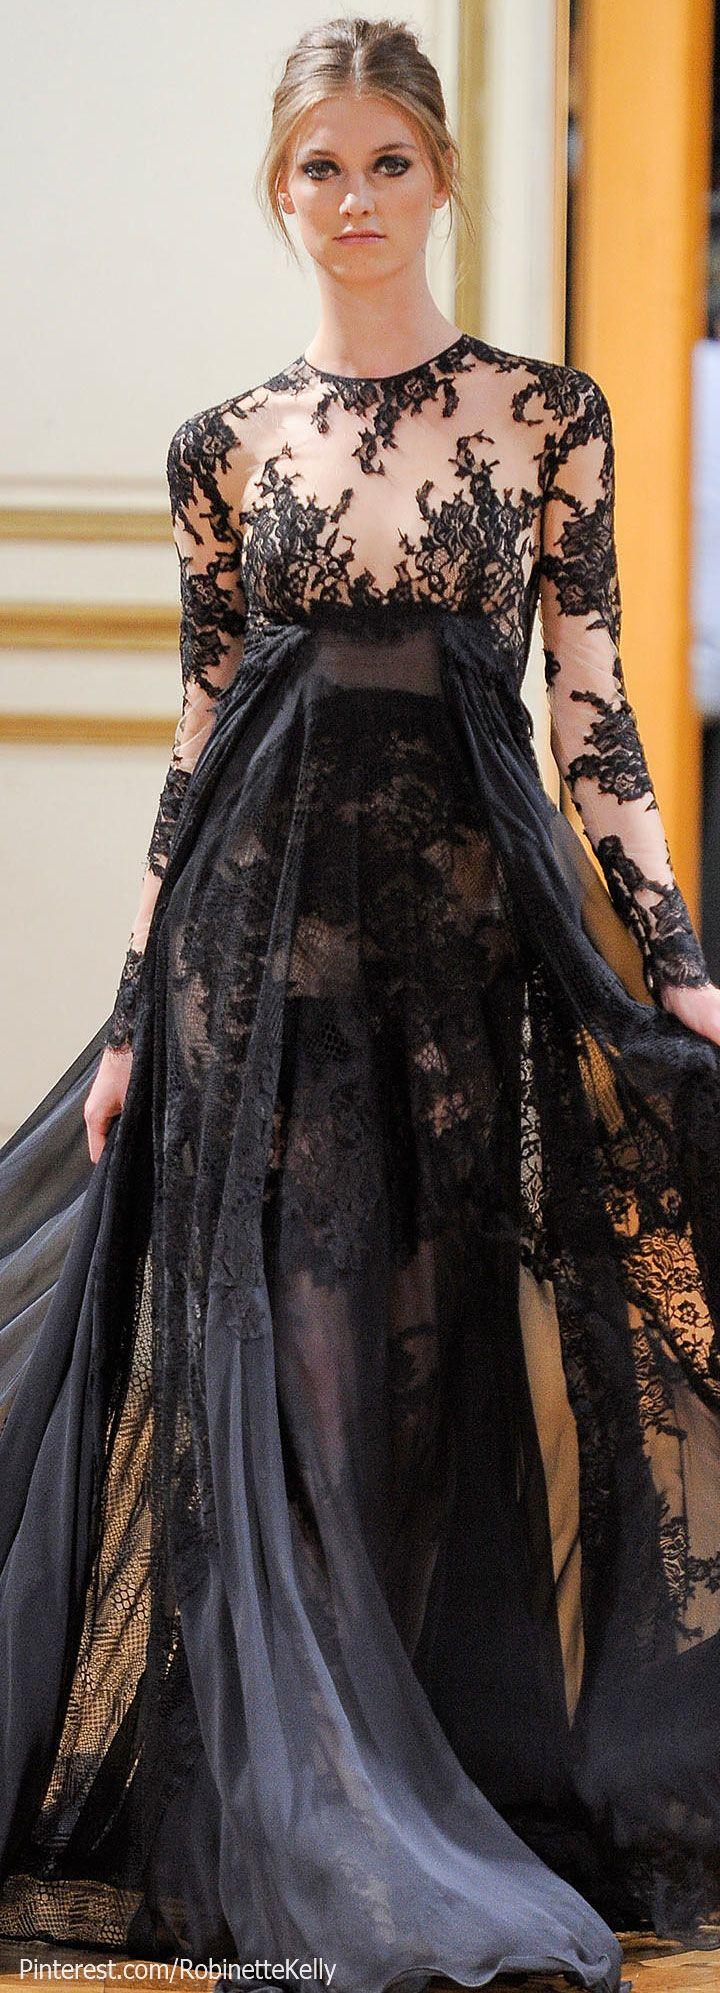 best dress images on pinterest ball gown black wedding